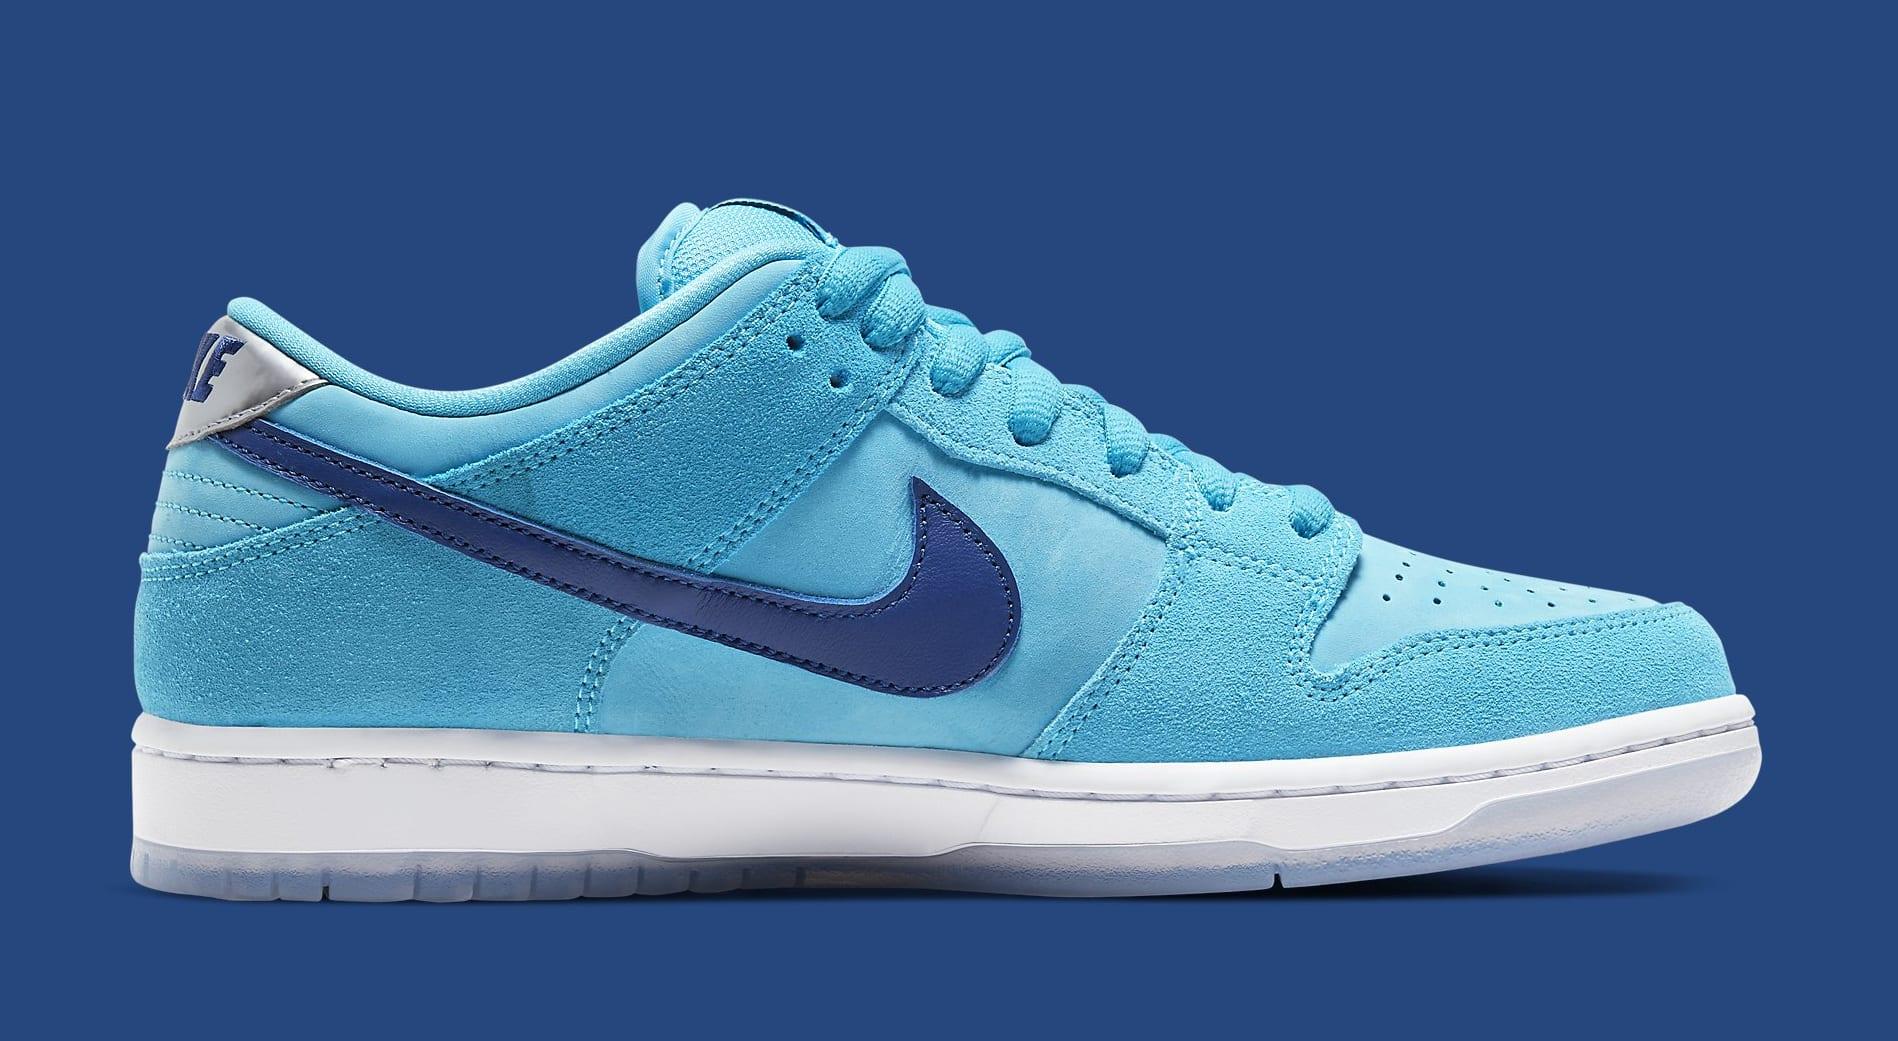 Nike SB Dunk Low 'Blue Fury' BQ6817-400 Medial